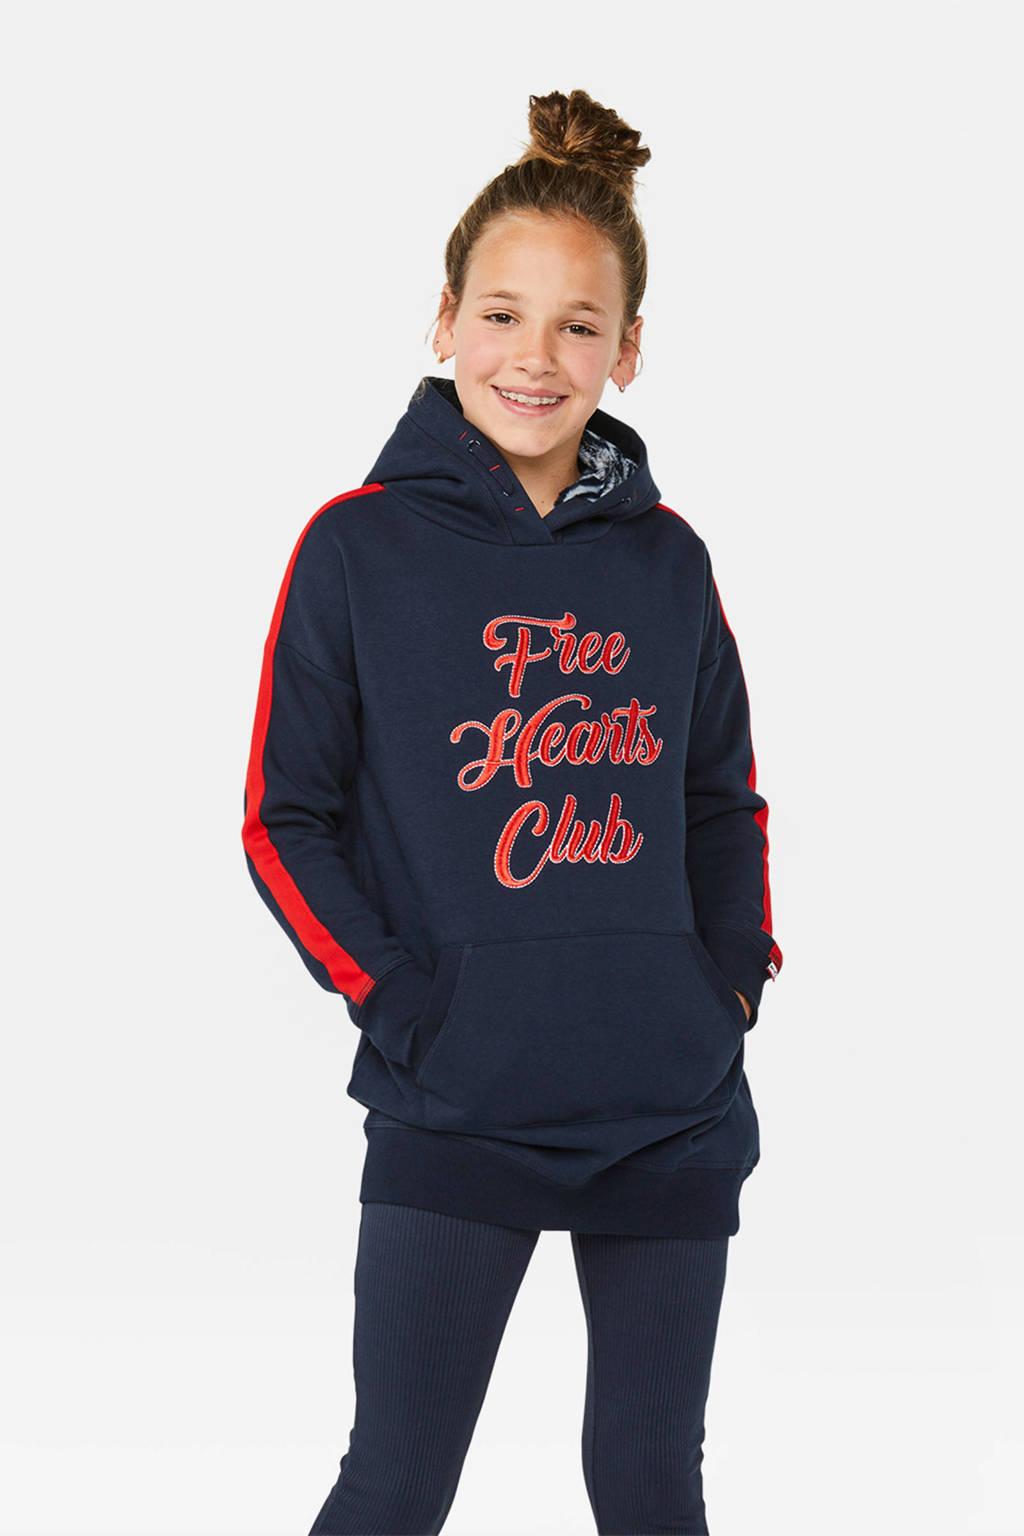 WE Fashion sweatjurk met contrastbies donkerblauw/rood, Donkerblauw/rood